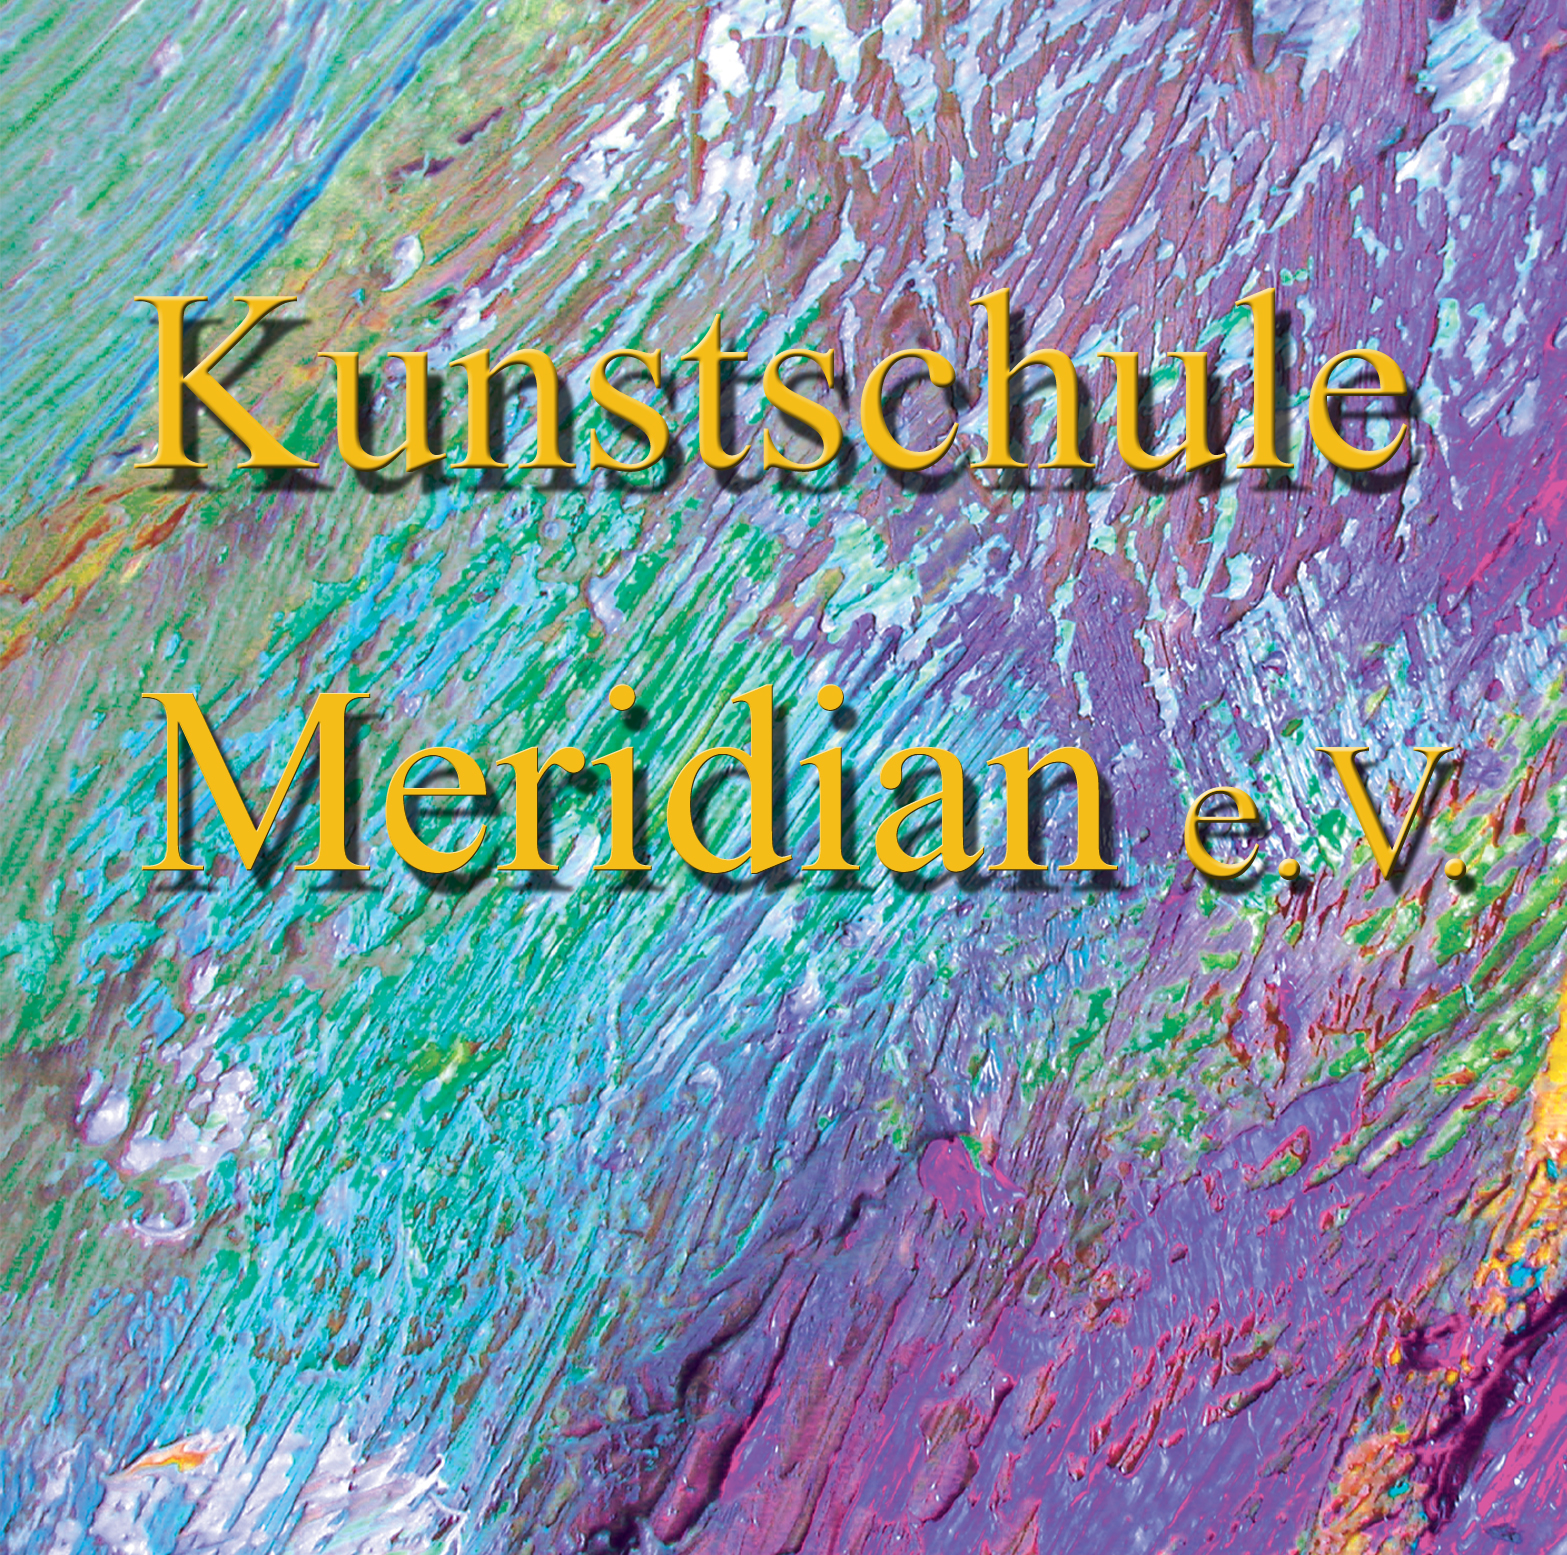 Kunstschule Meridian e.V